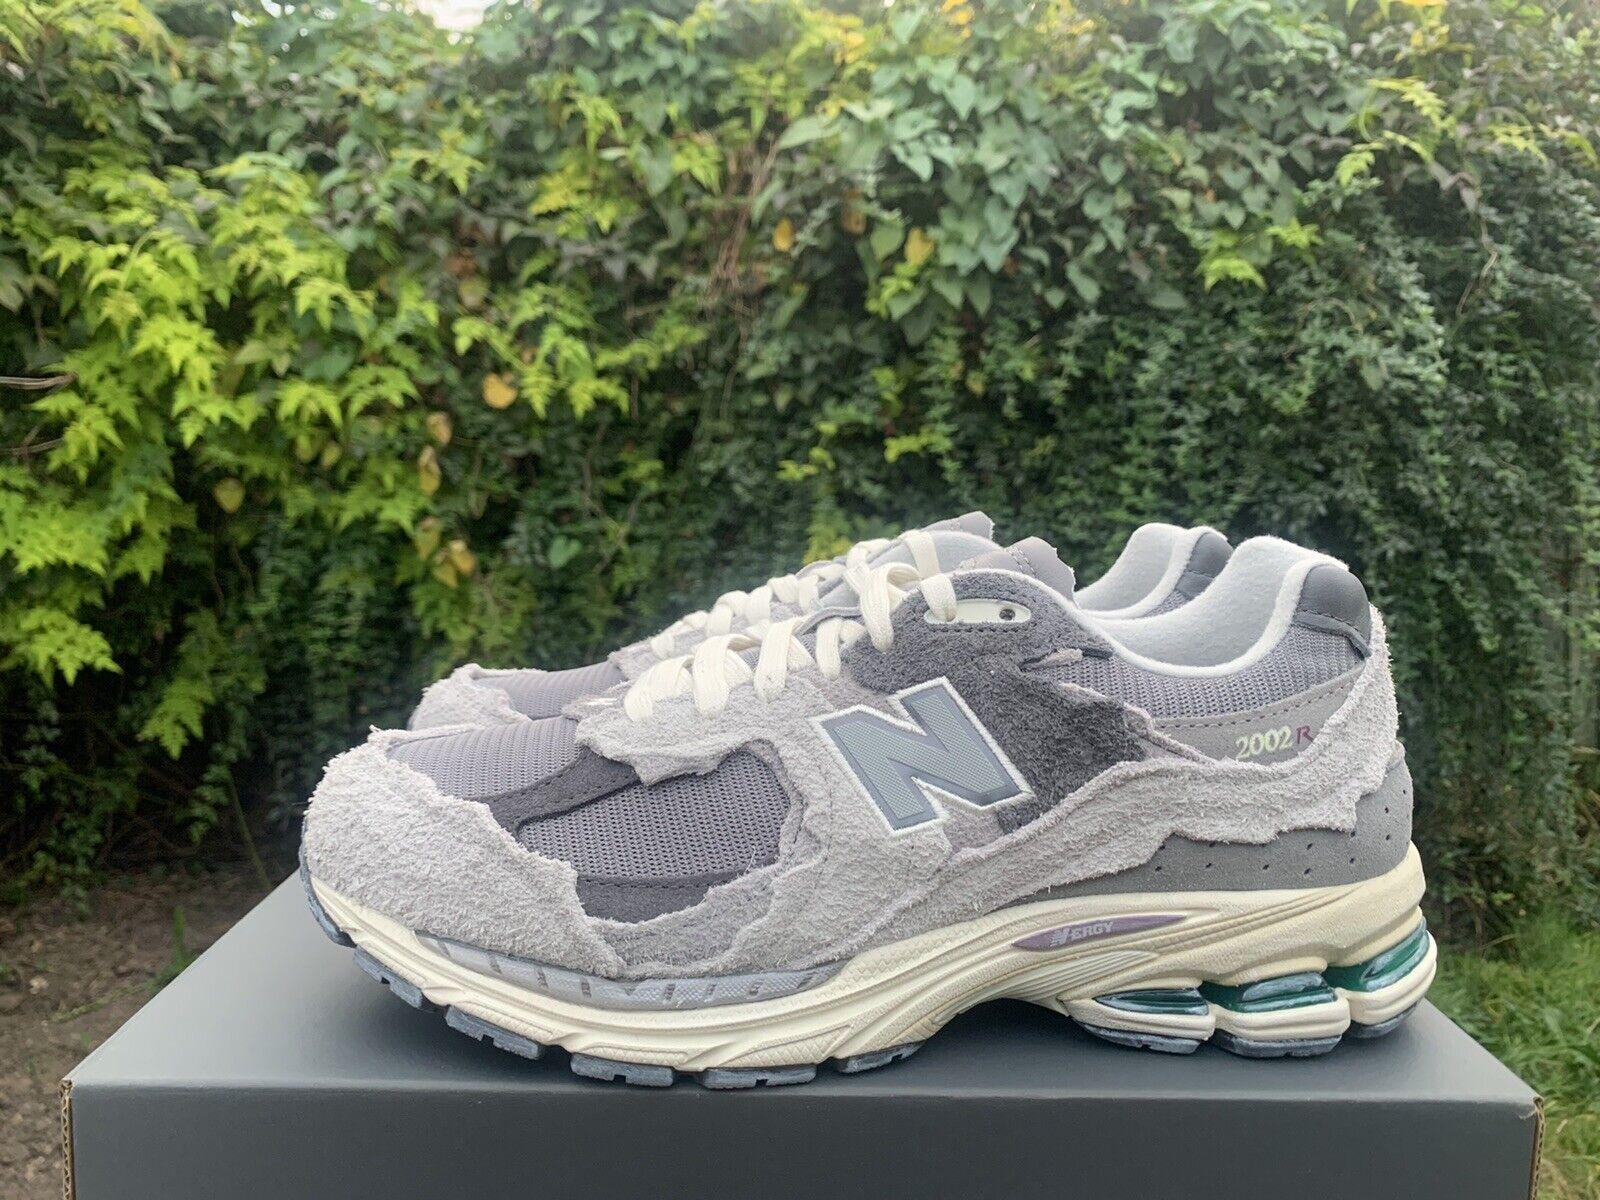 New Balance 2002R 'Rain Cloud' Protection Pack   UK 9   Brand New   Fast Ship📦